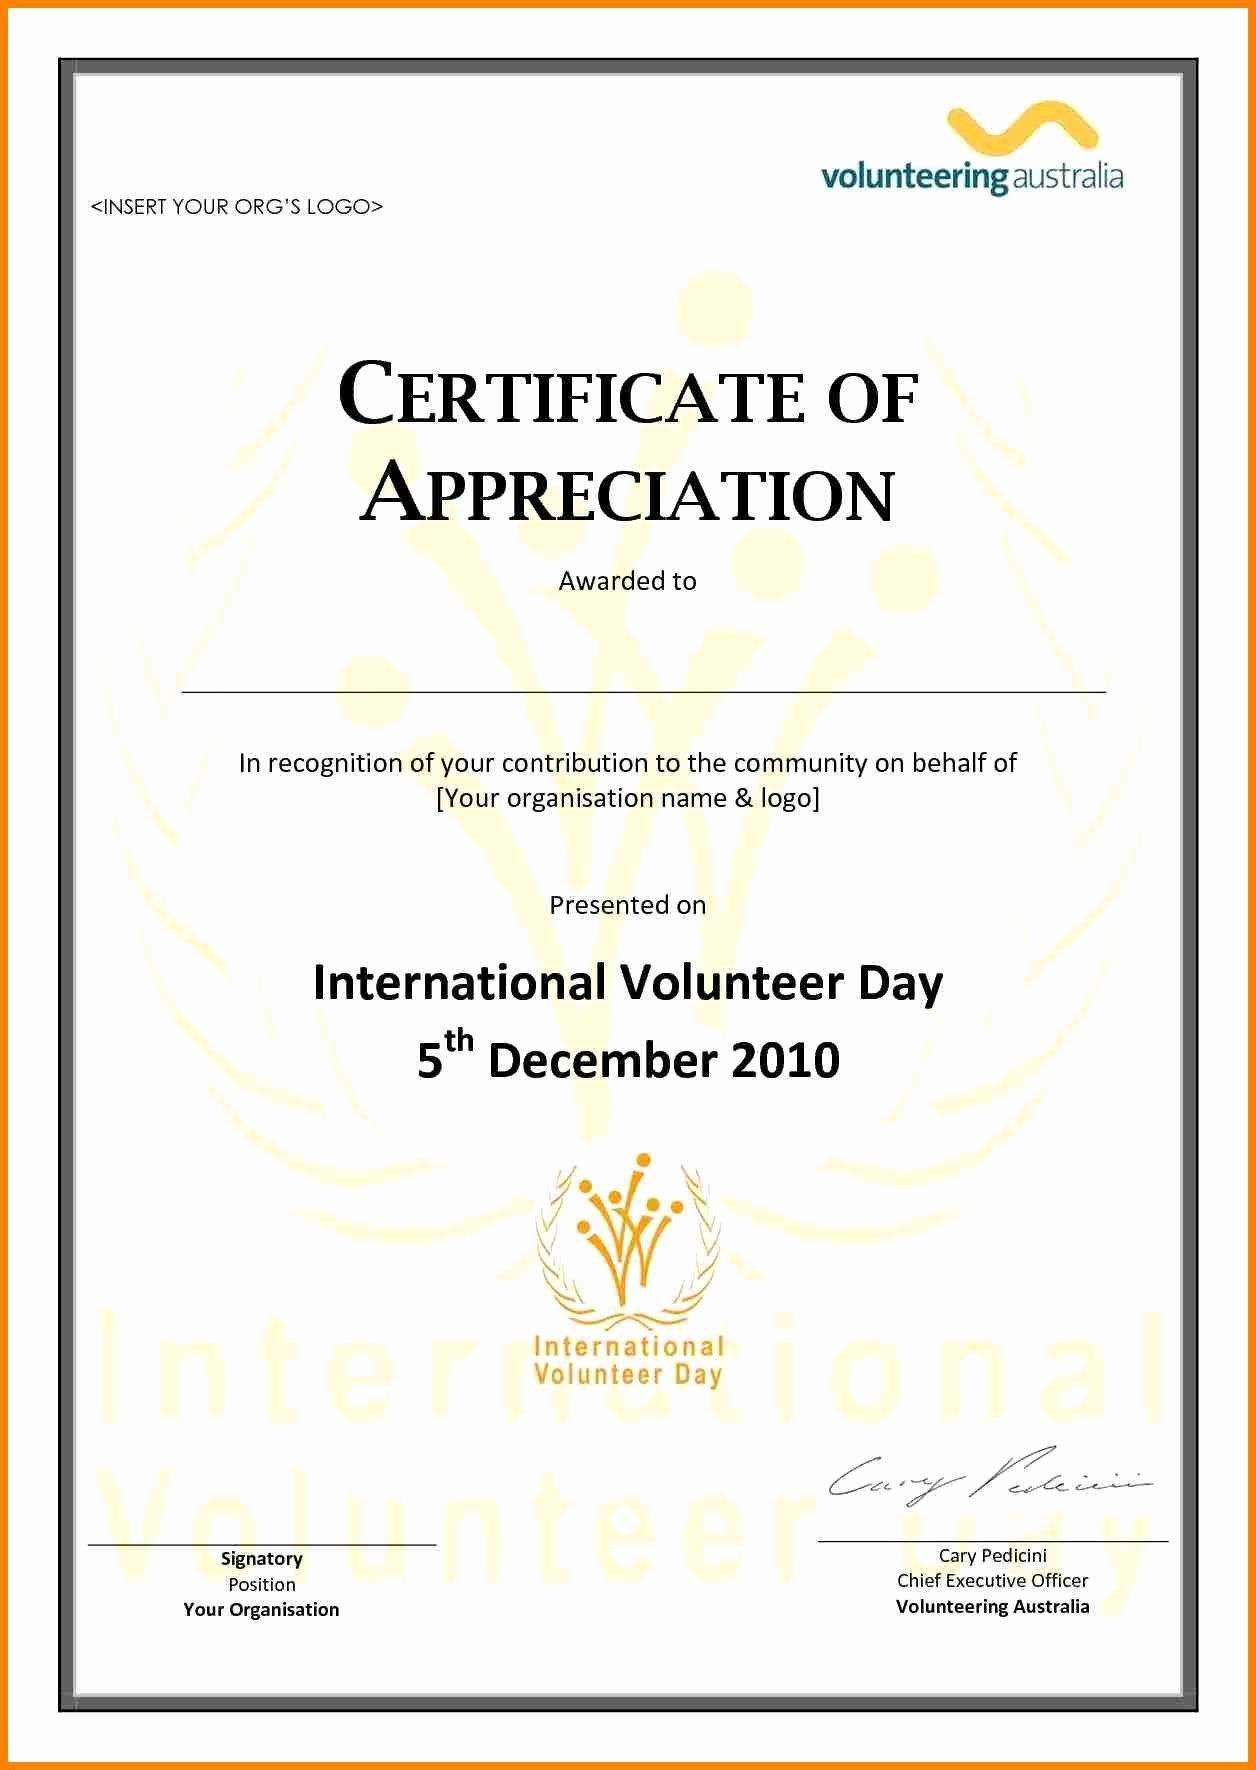 Volunteer Appreciation Certificate Templates Luxury Volunteer Appreciation Certificate Template